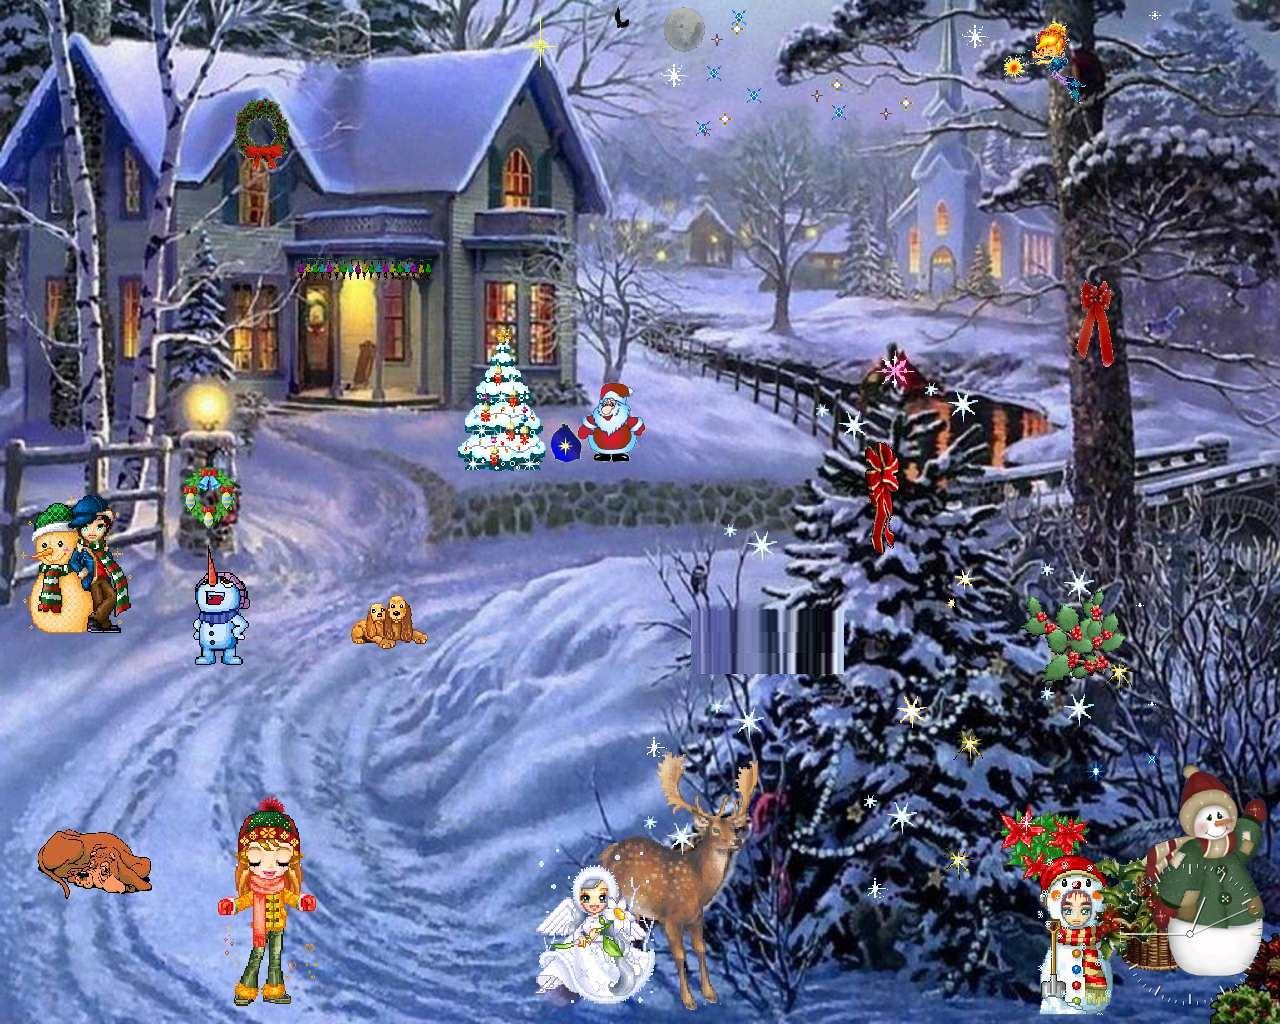 Christmas Screensavers for Mac Desktop Backgrounds 1280x1024